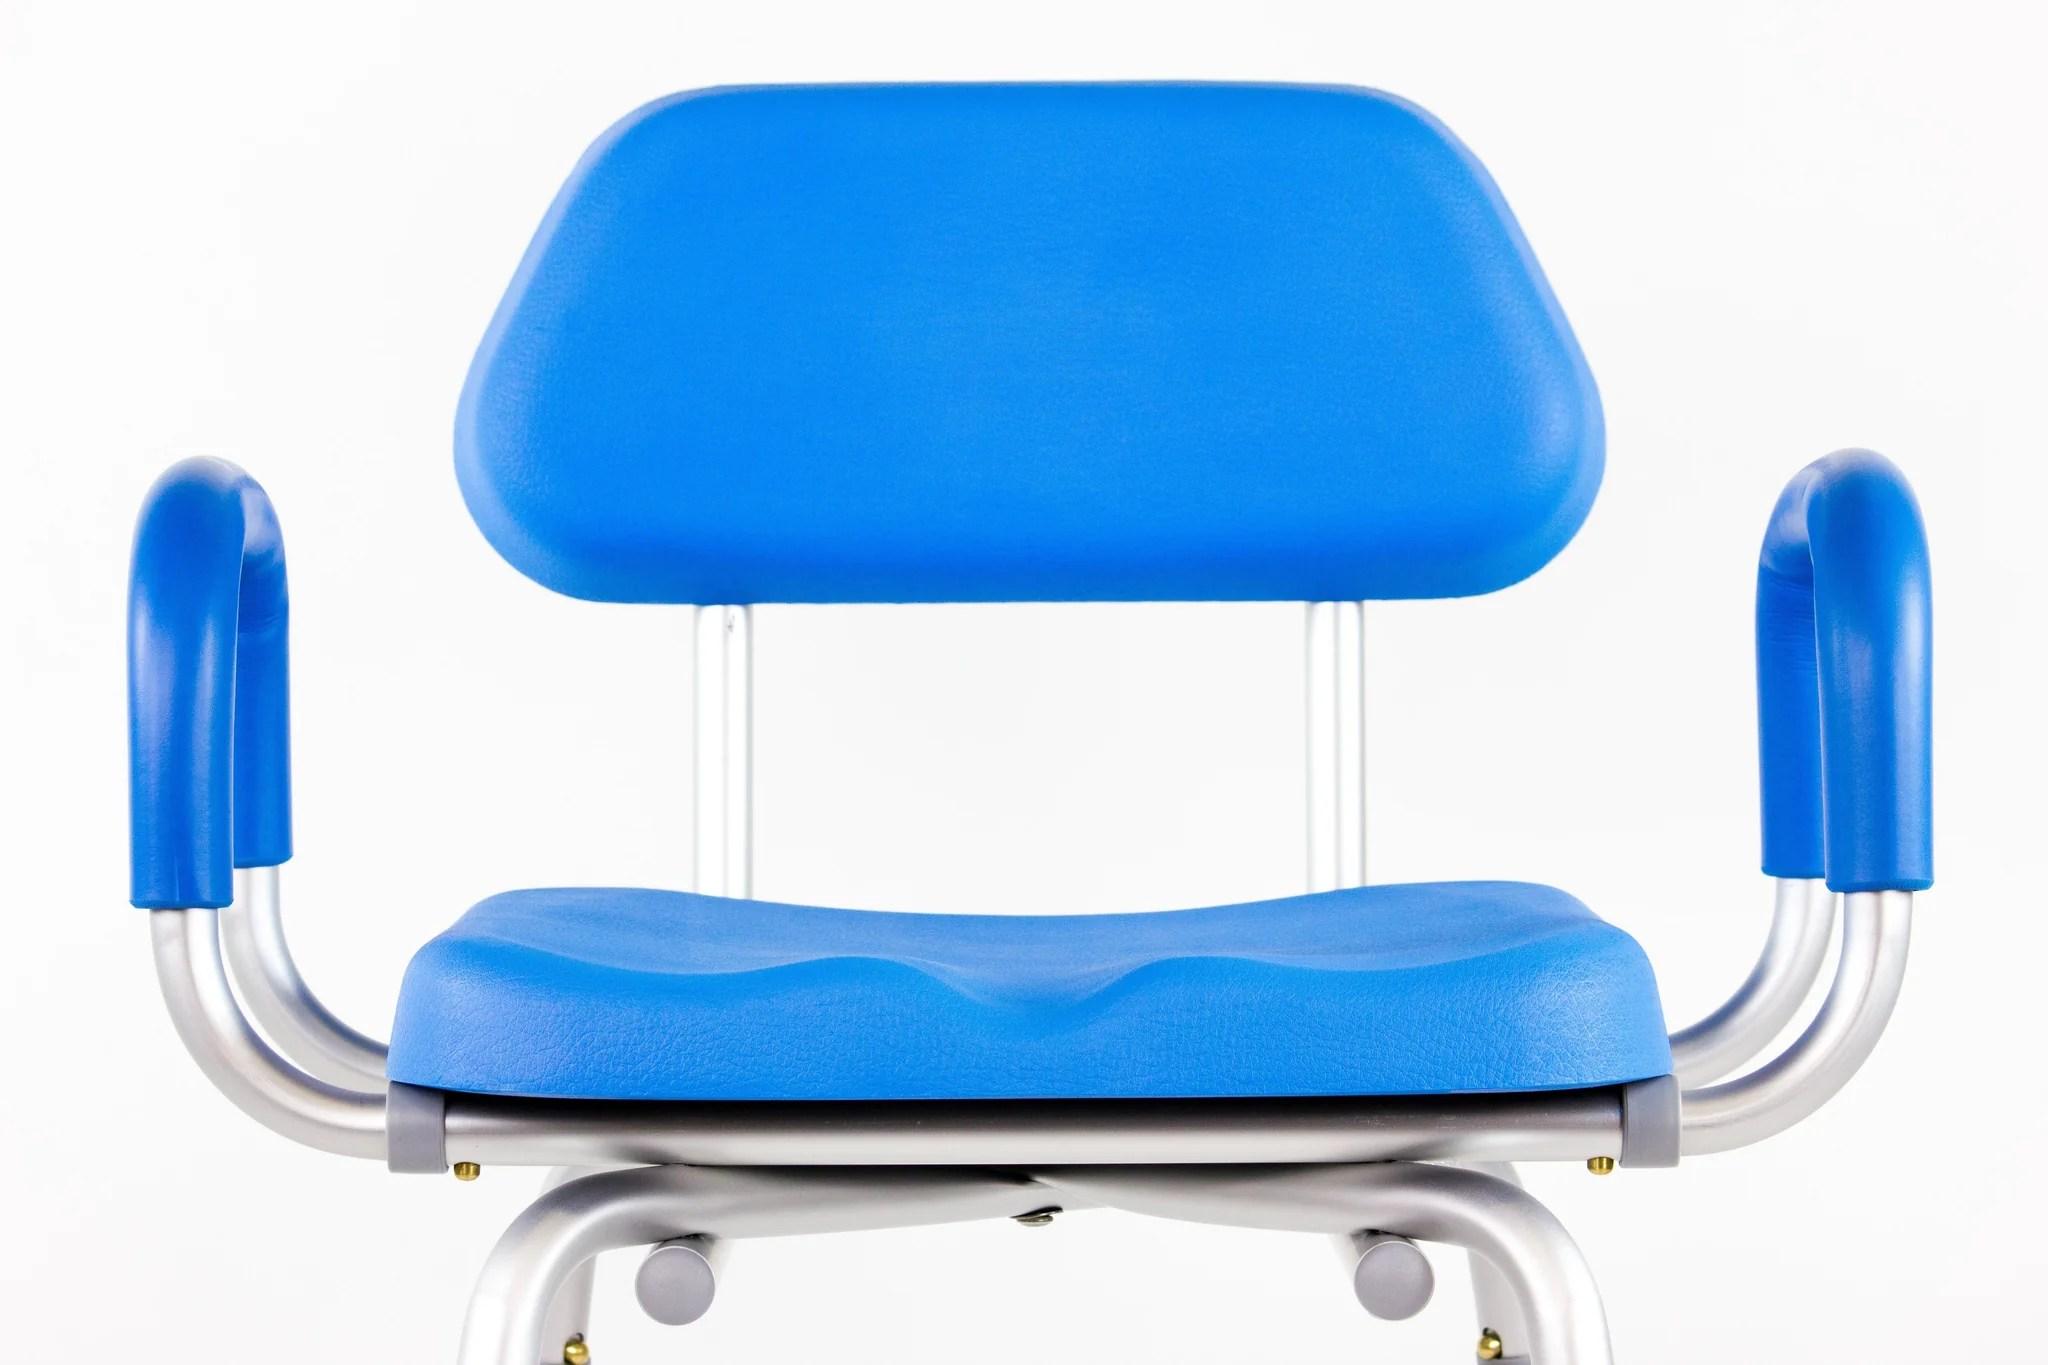 hip surgery chair desk edmonton platinum health apex tm bath shower